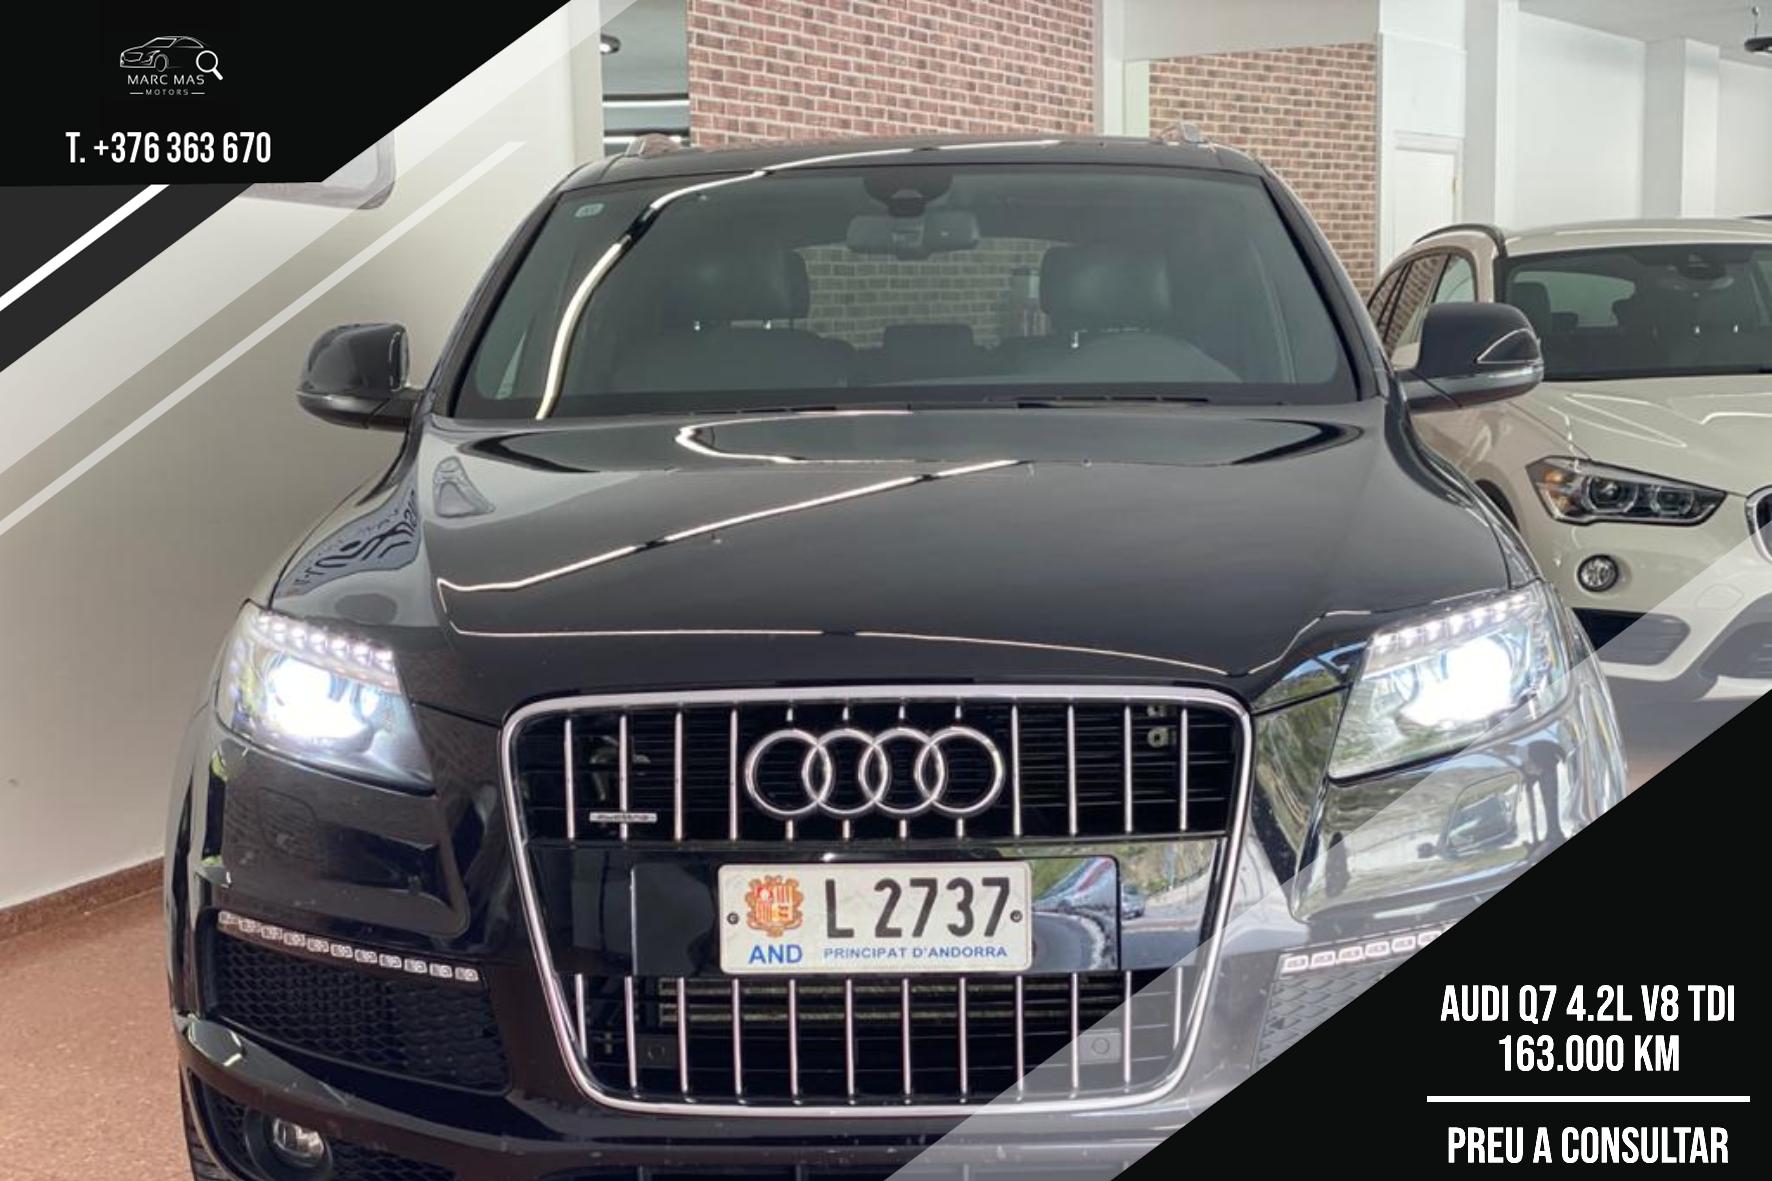 Audi - Q7 - V8 TDI   A Consultar